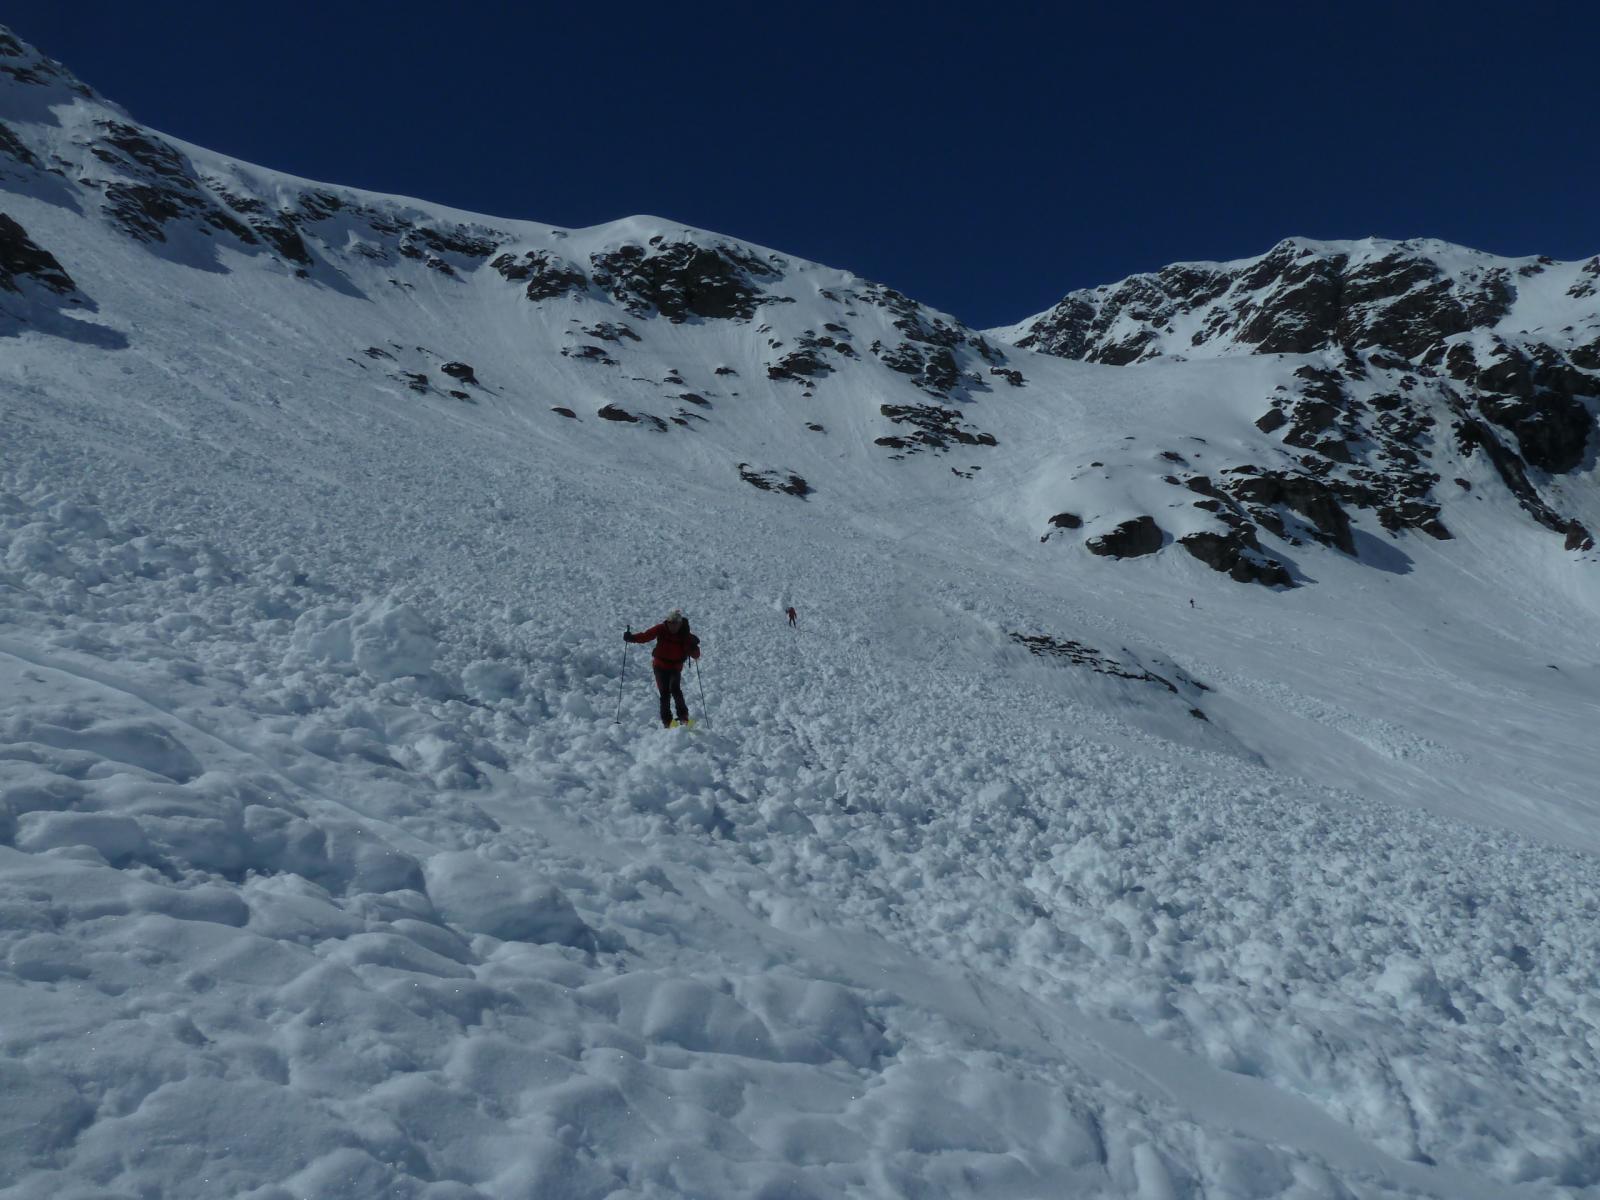 sciando su valanga